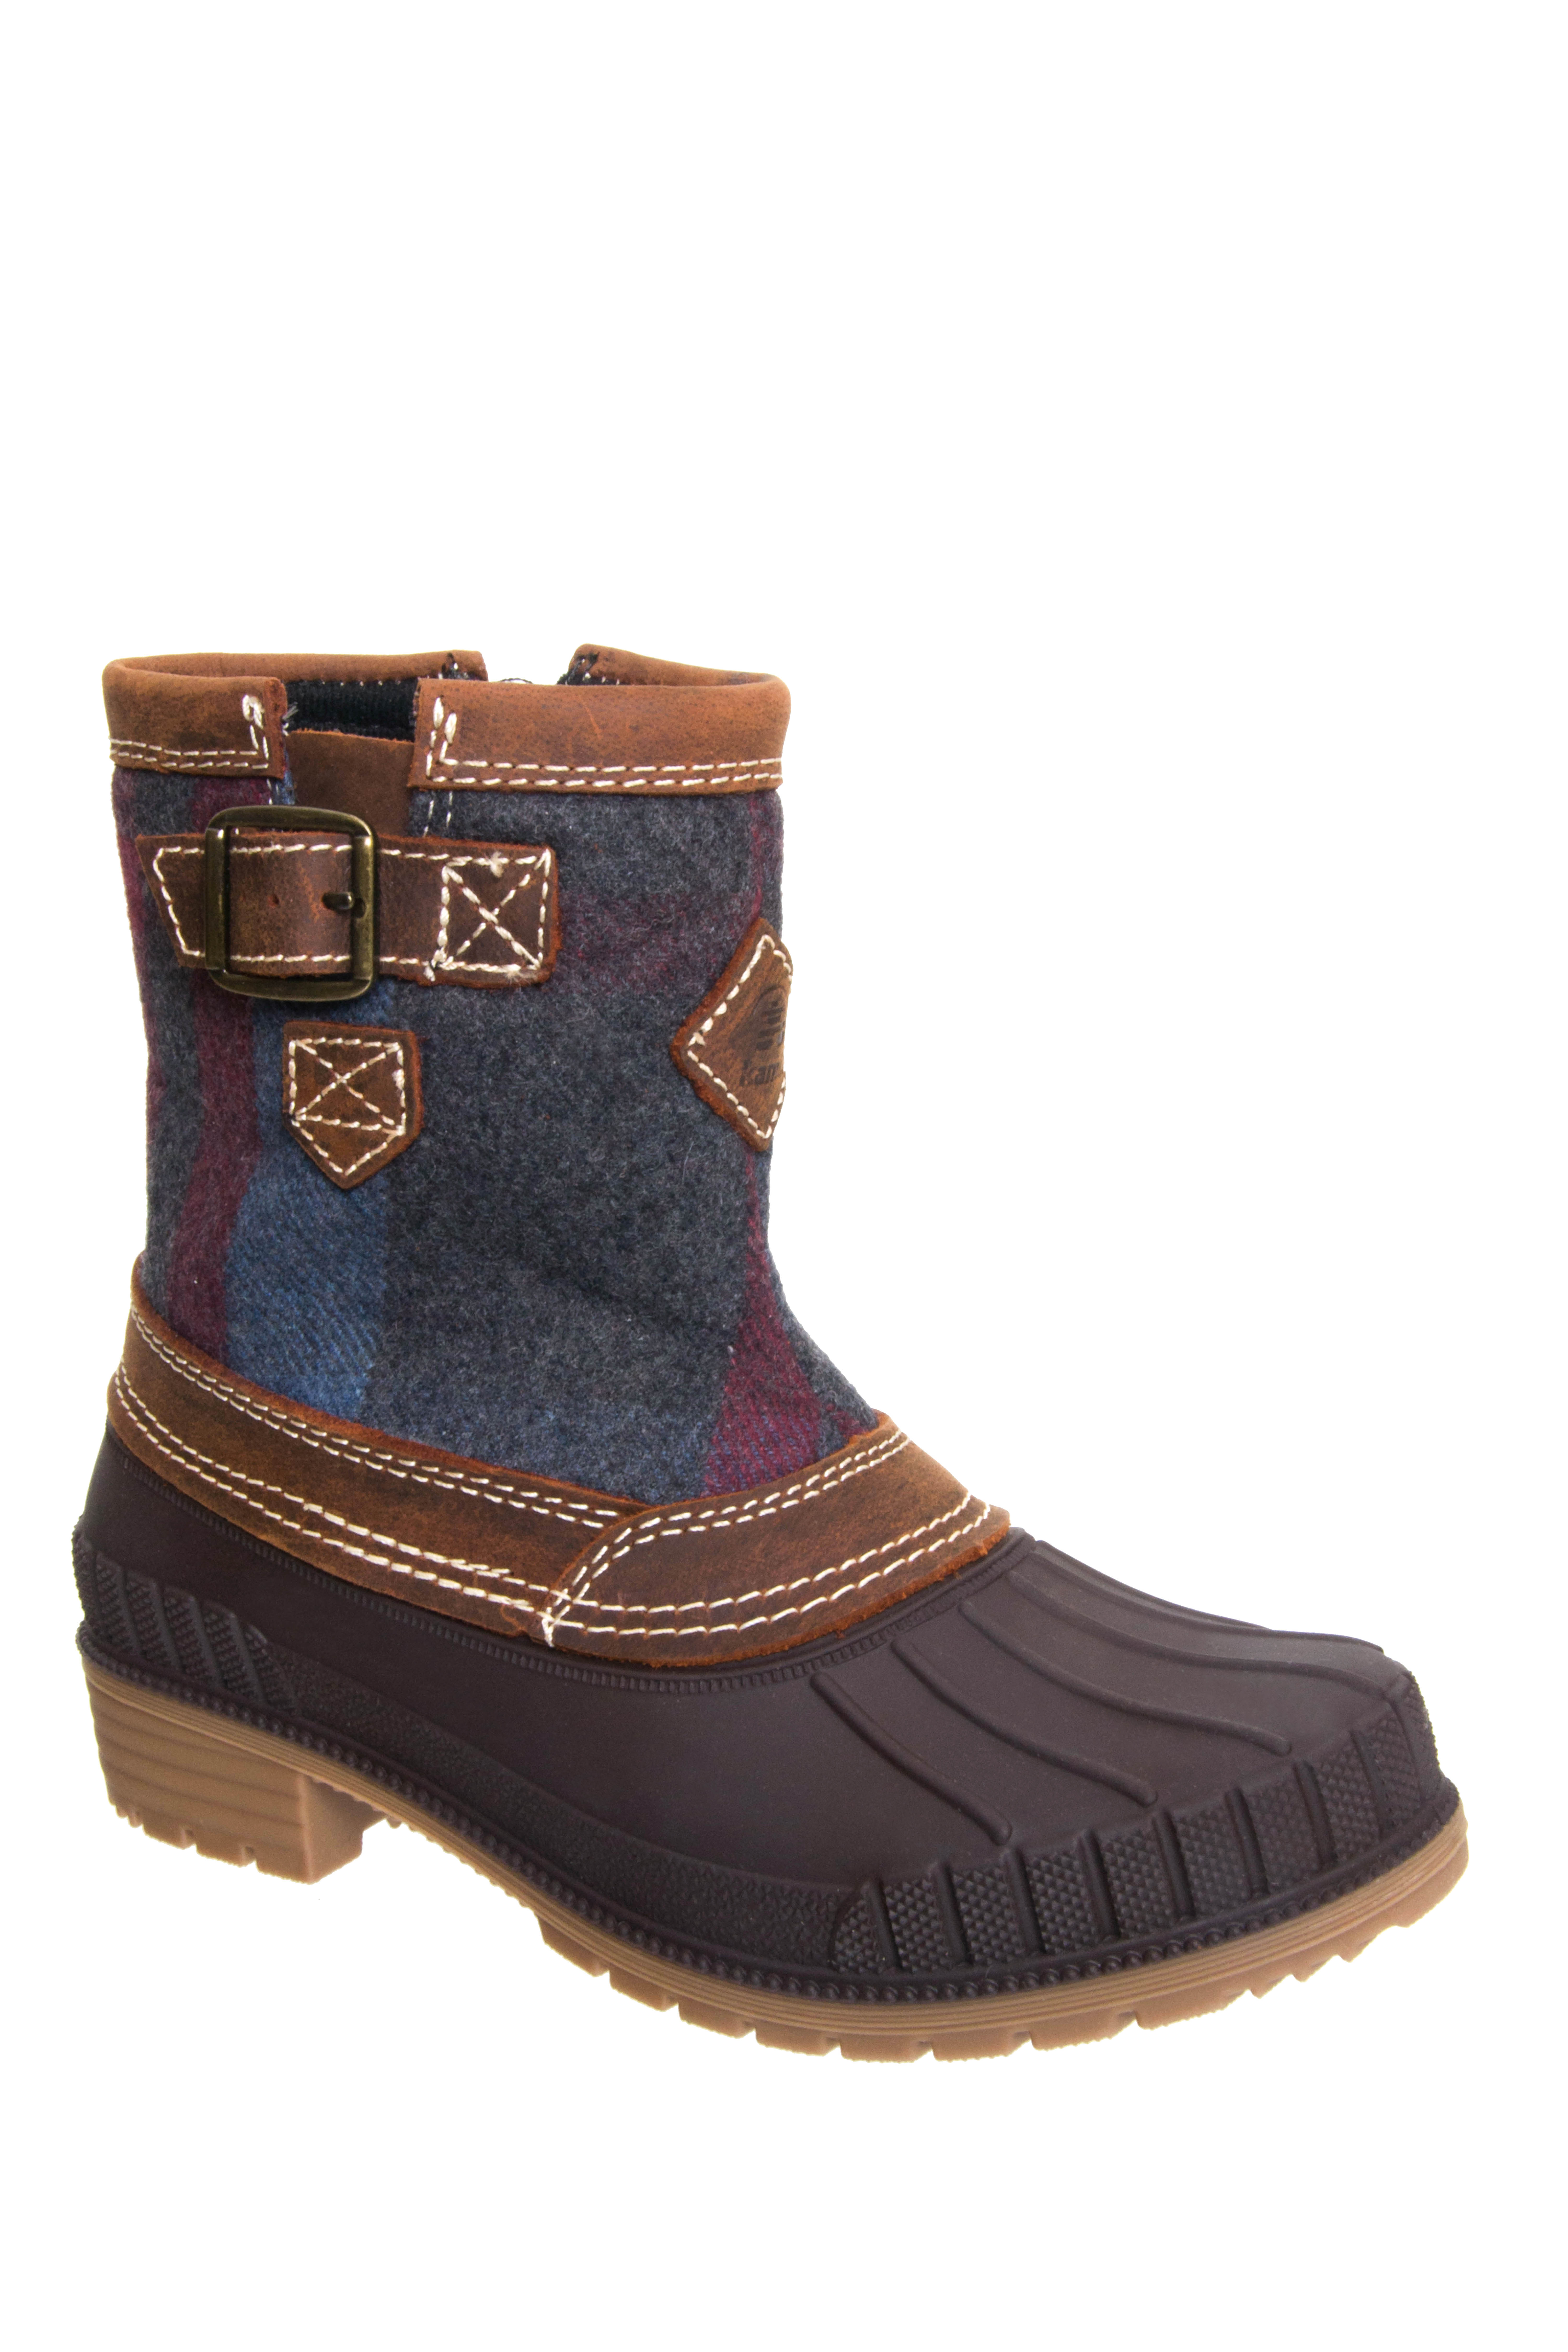 Kamik Avelle Low Heel Snow Boots - Dark Brown